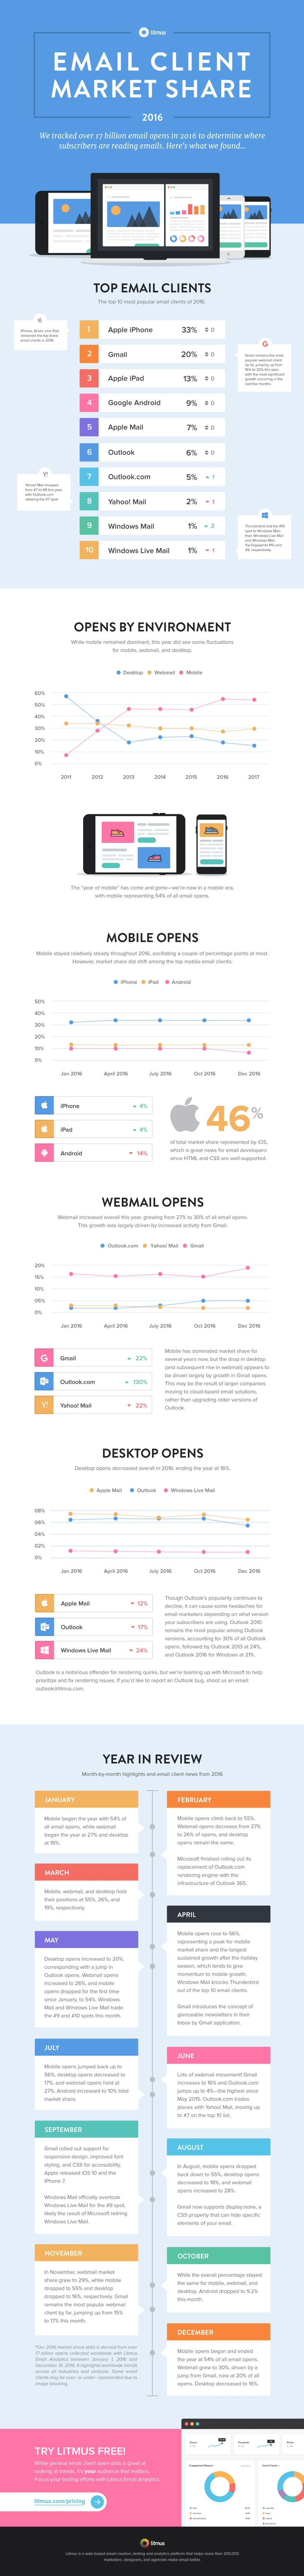 infographie marché boite mail 2017